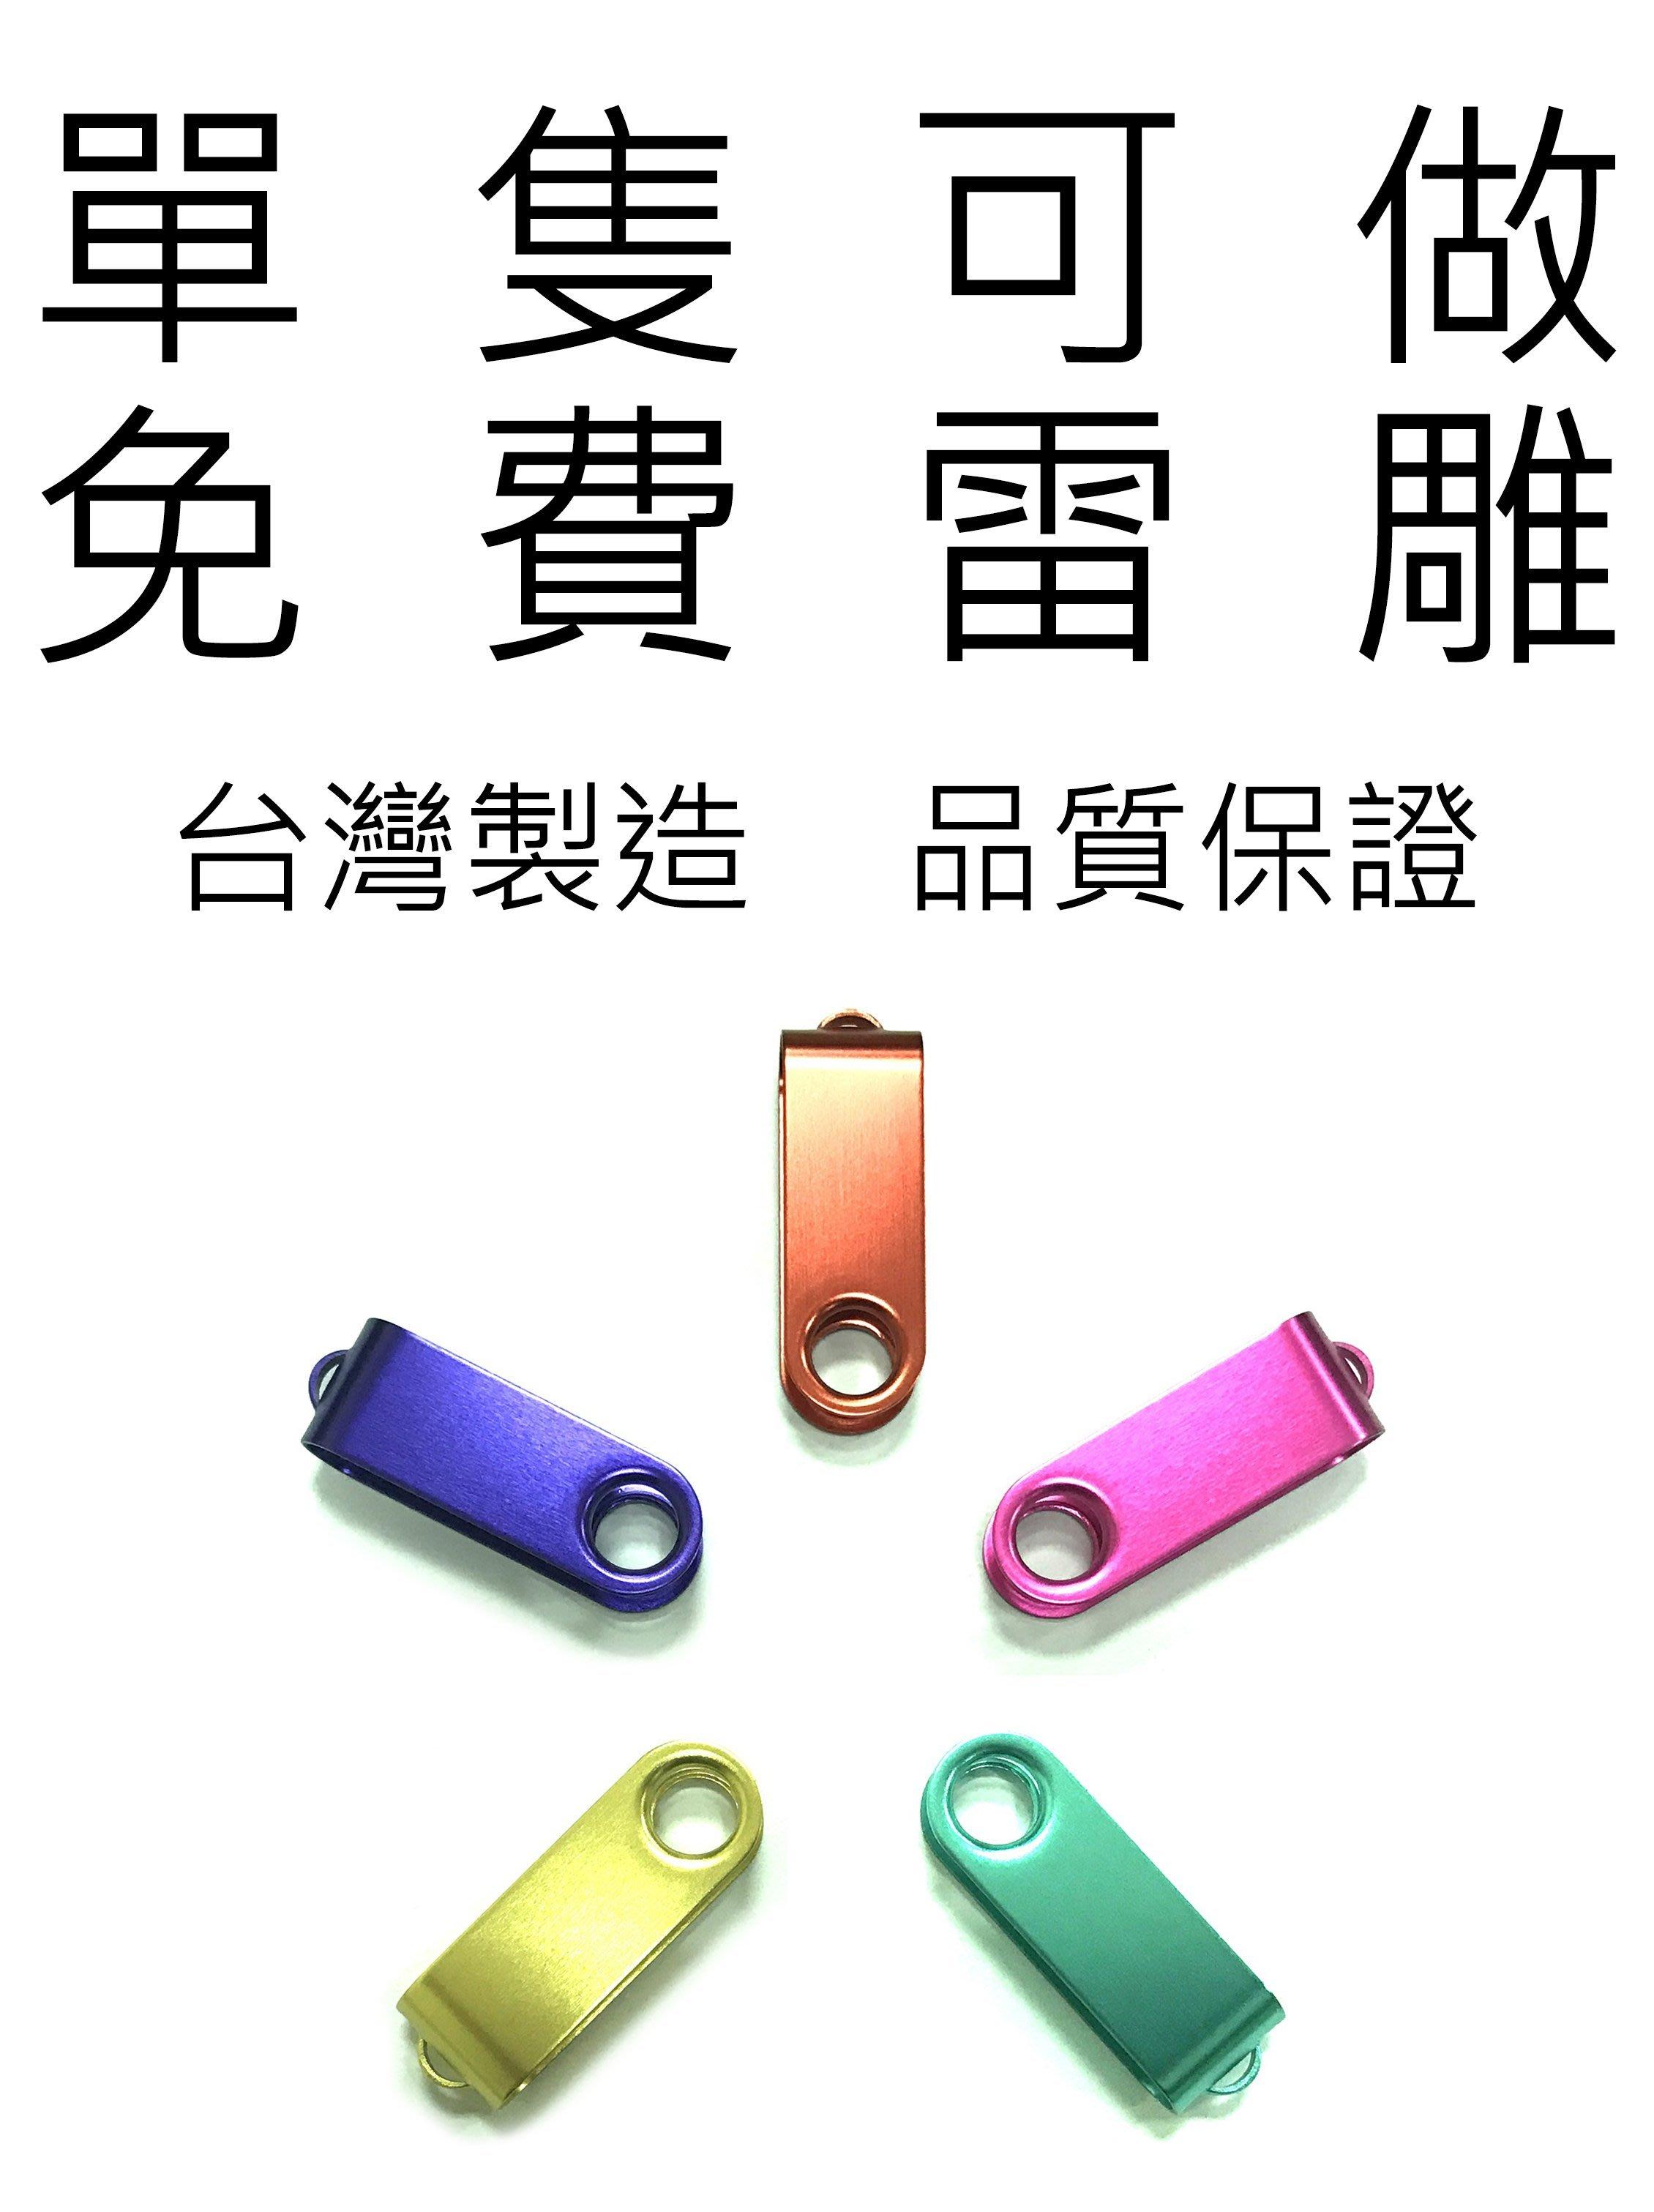 [OMO客製工坊] 素色8G USB 隨身碟 多款顏色 免費雷雕 單隻可做 客製化 畢業 禮物 禮品 特價